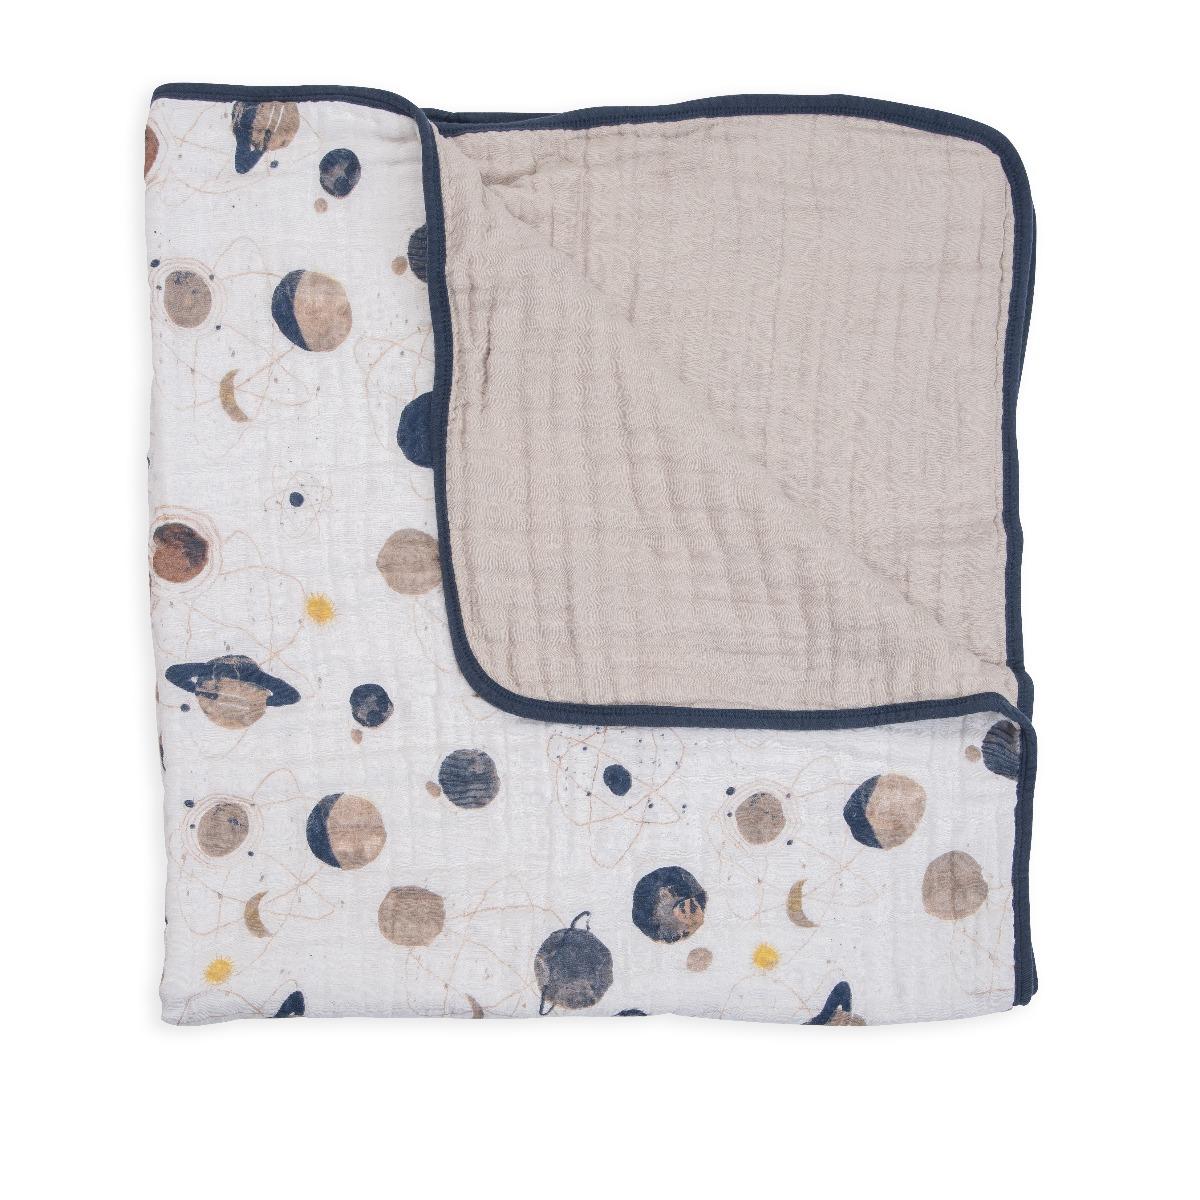 Little Unicorn Cotton Muslin Quilt Planetary